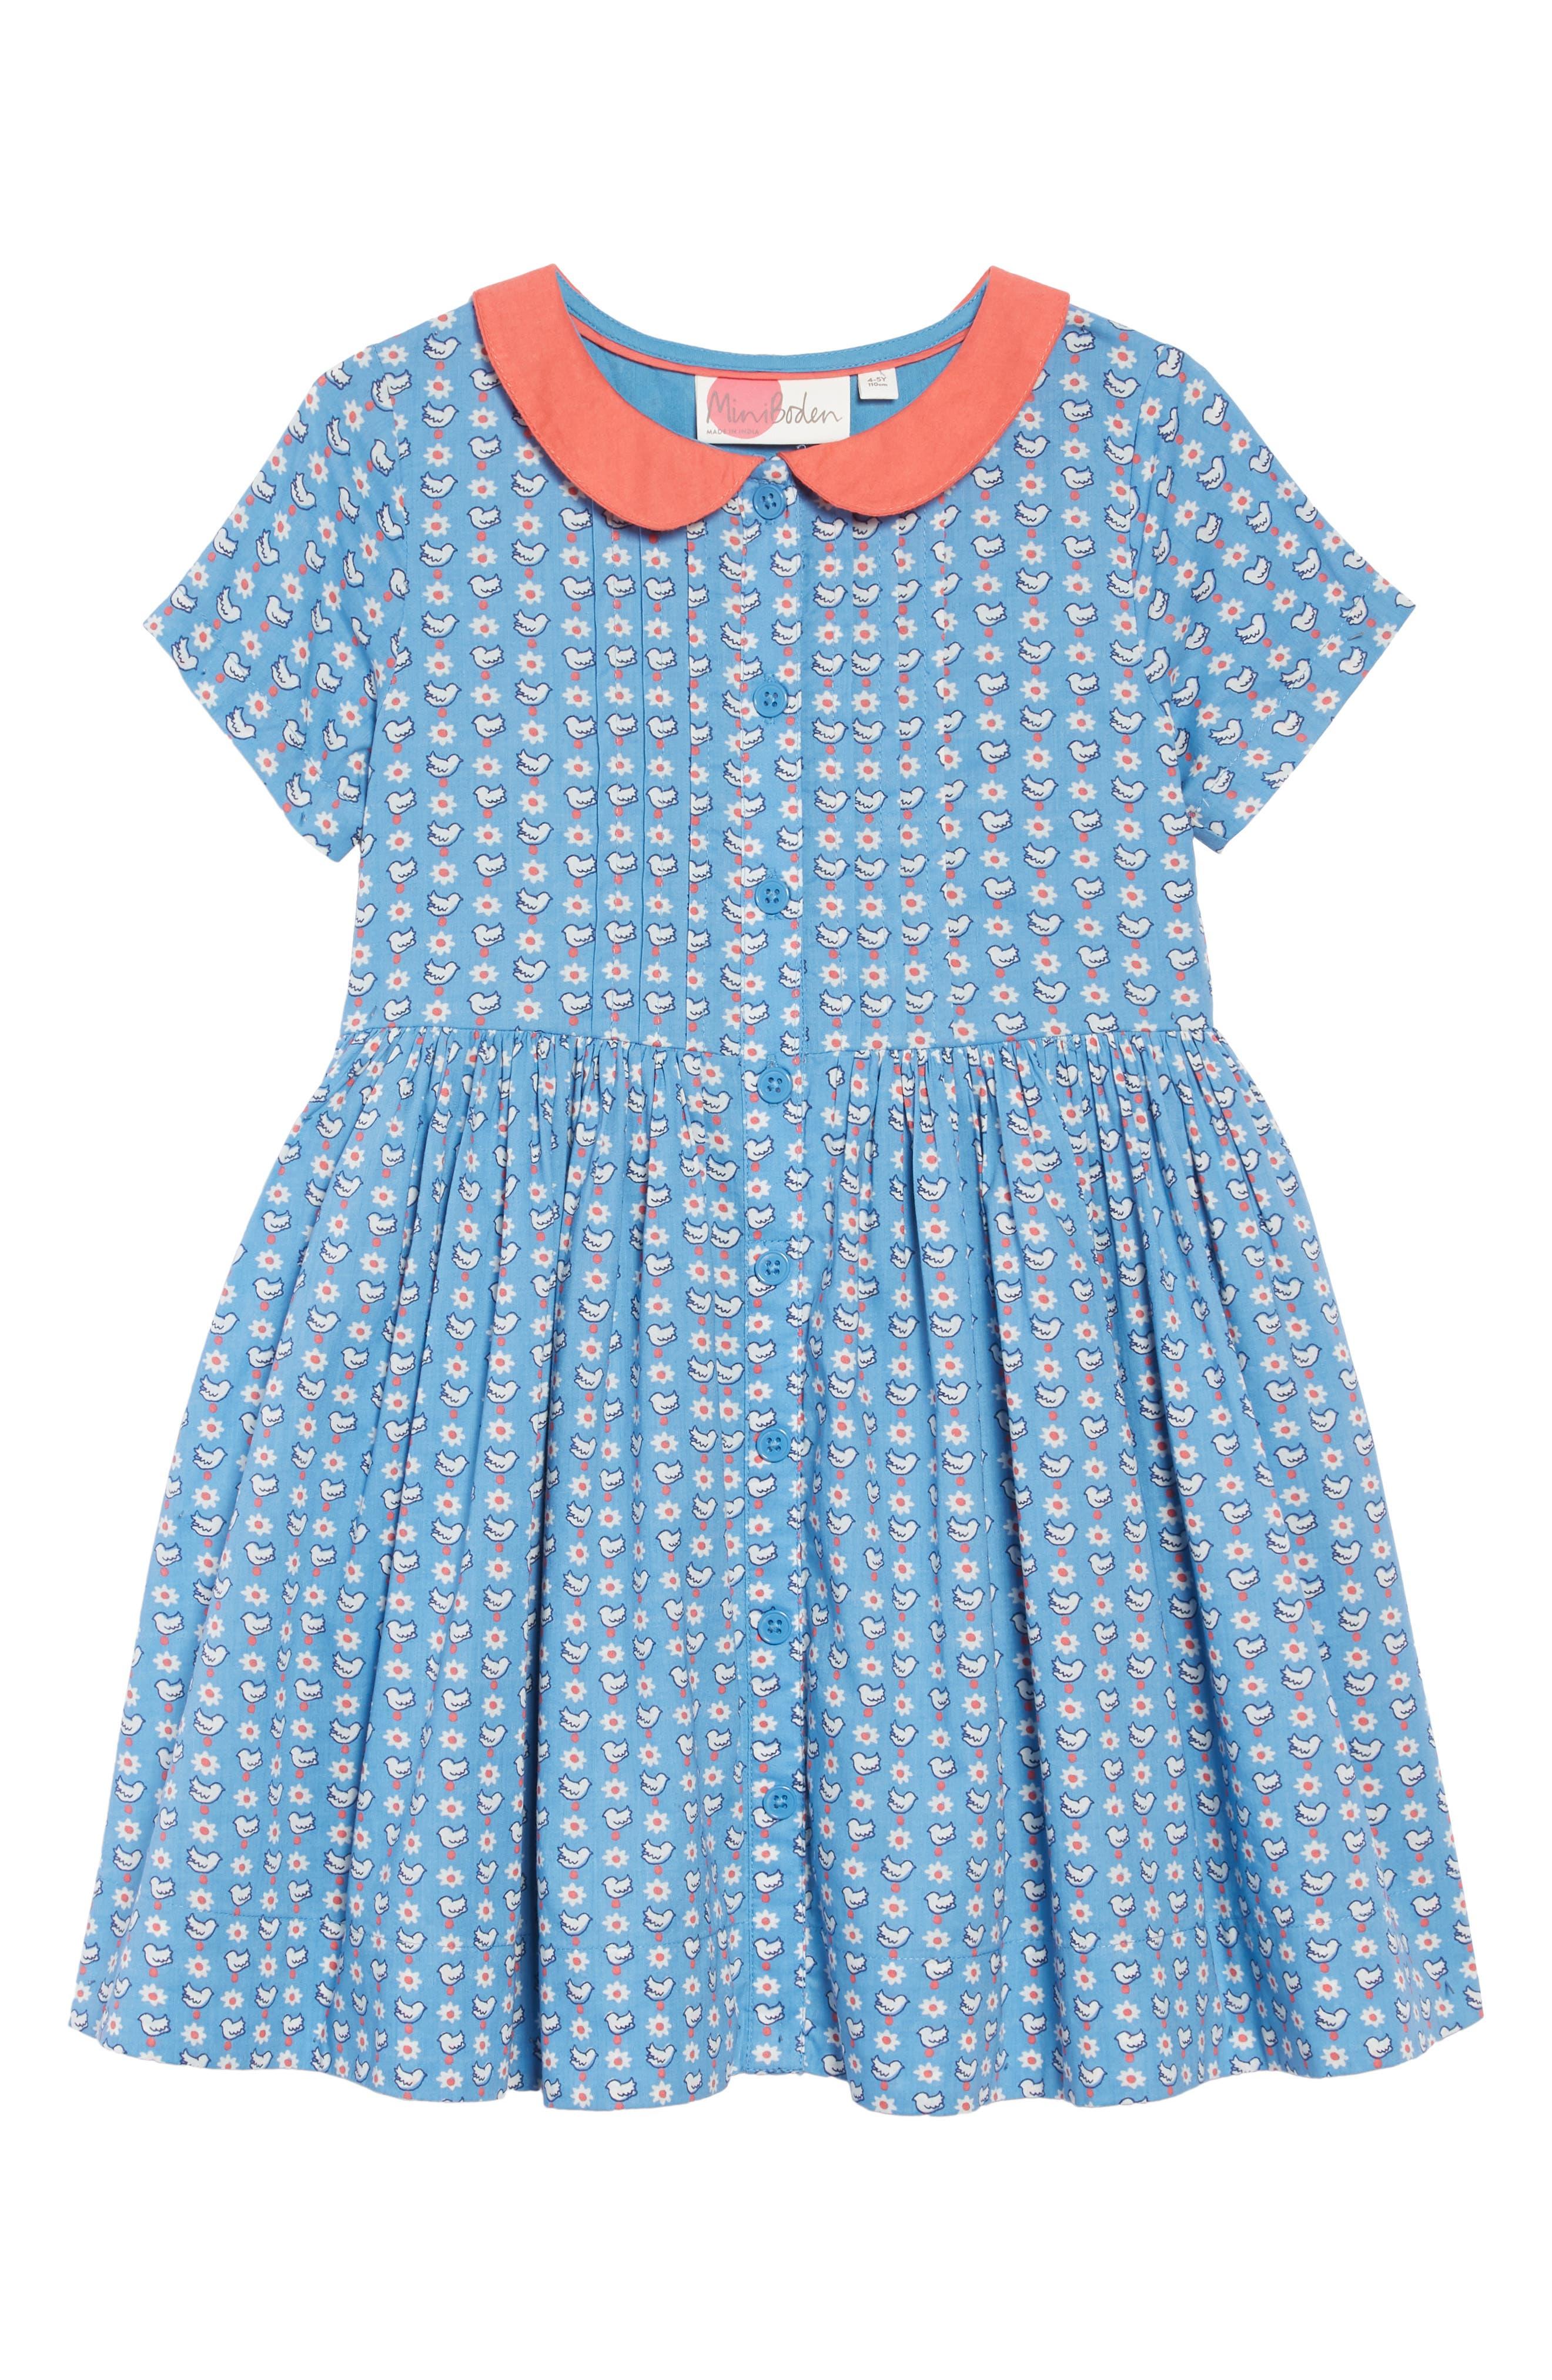 Nostalgic Collared Dress,                             Main thumbnail 1, color,                             BLUE GEO BIRDS